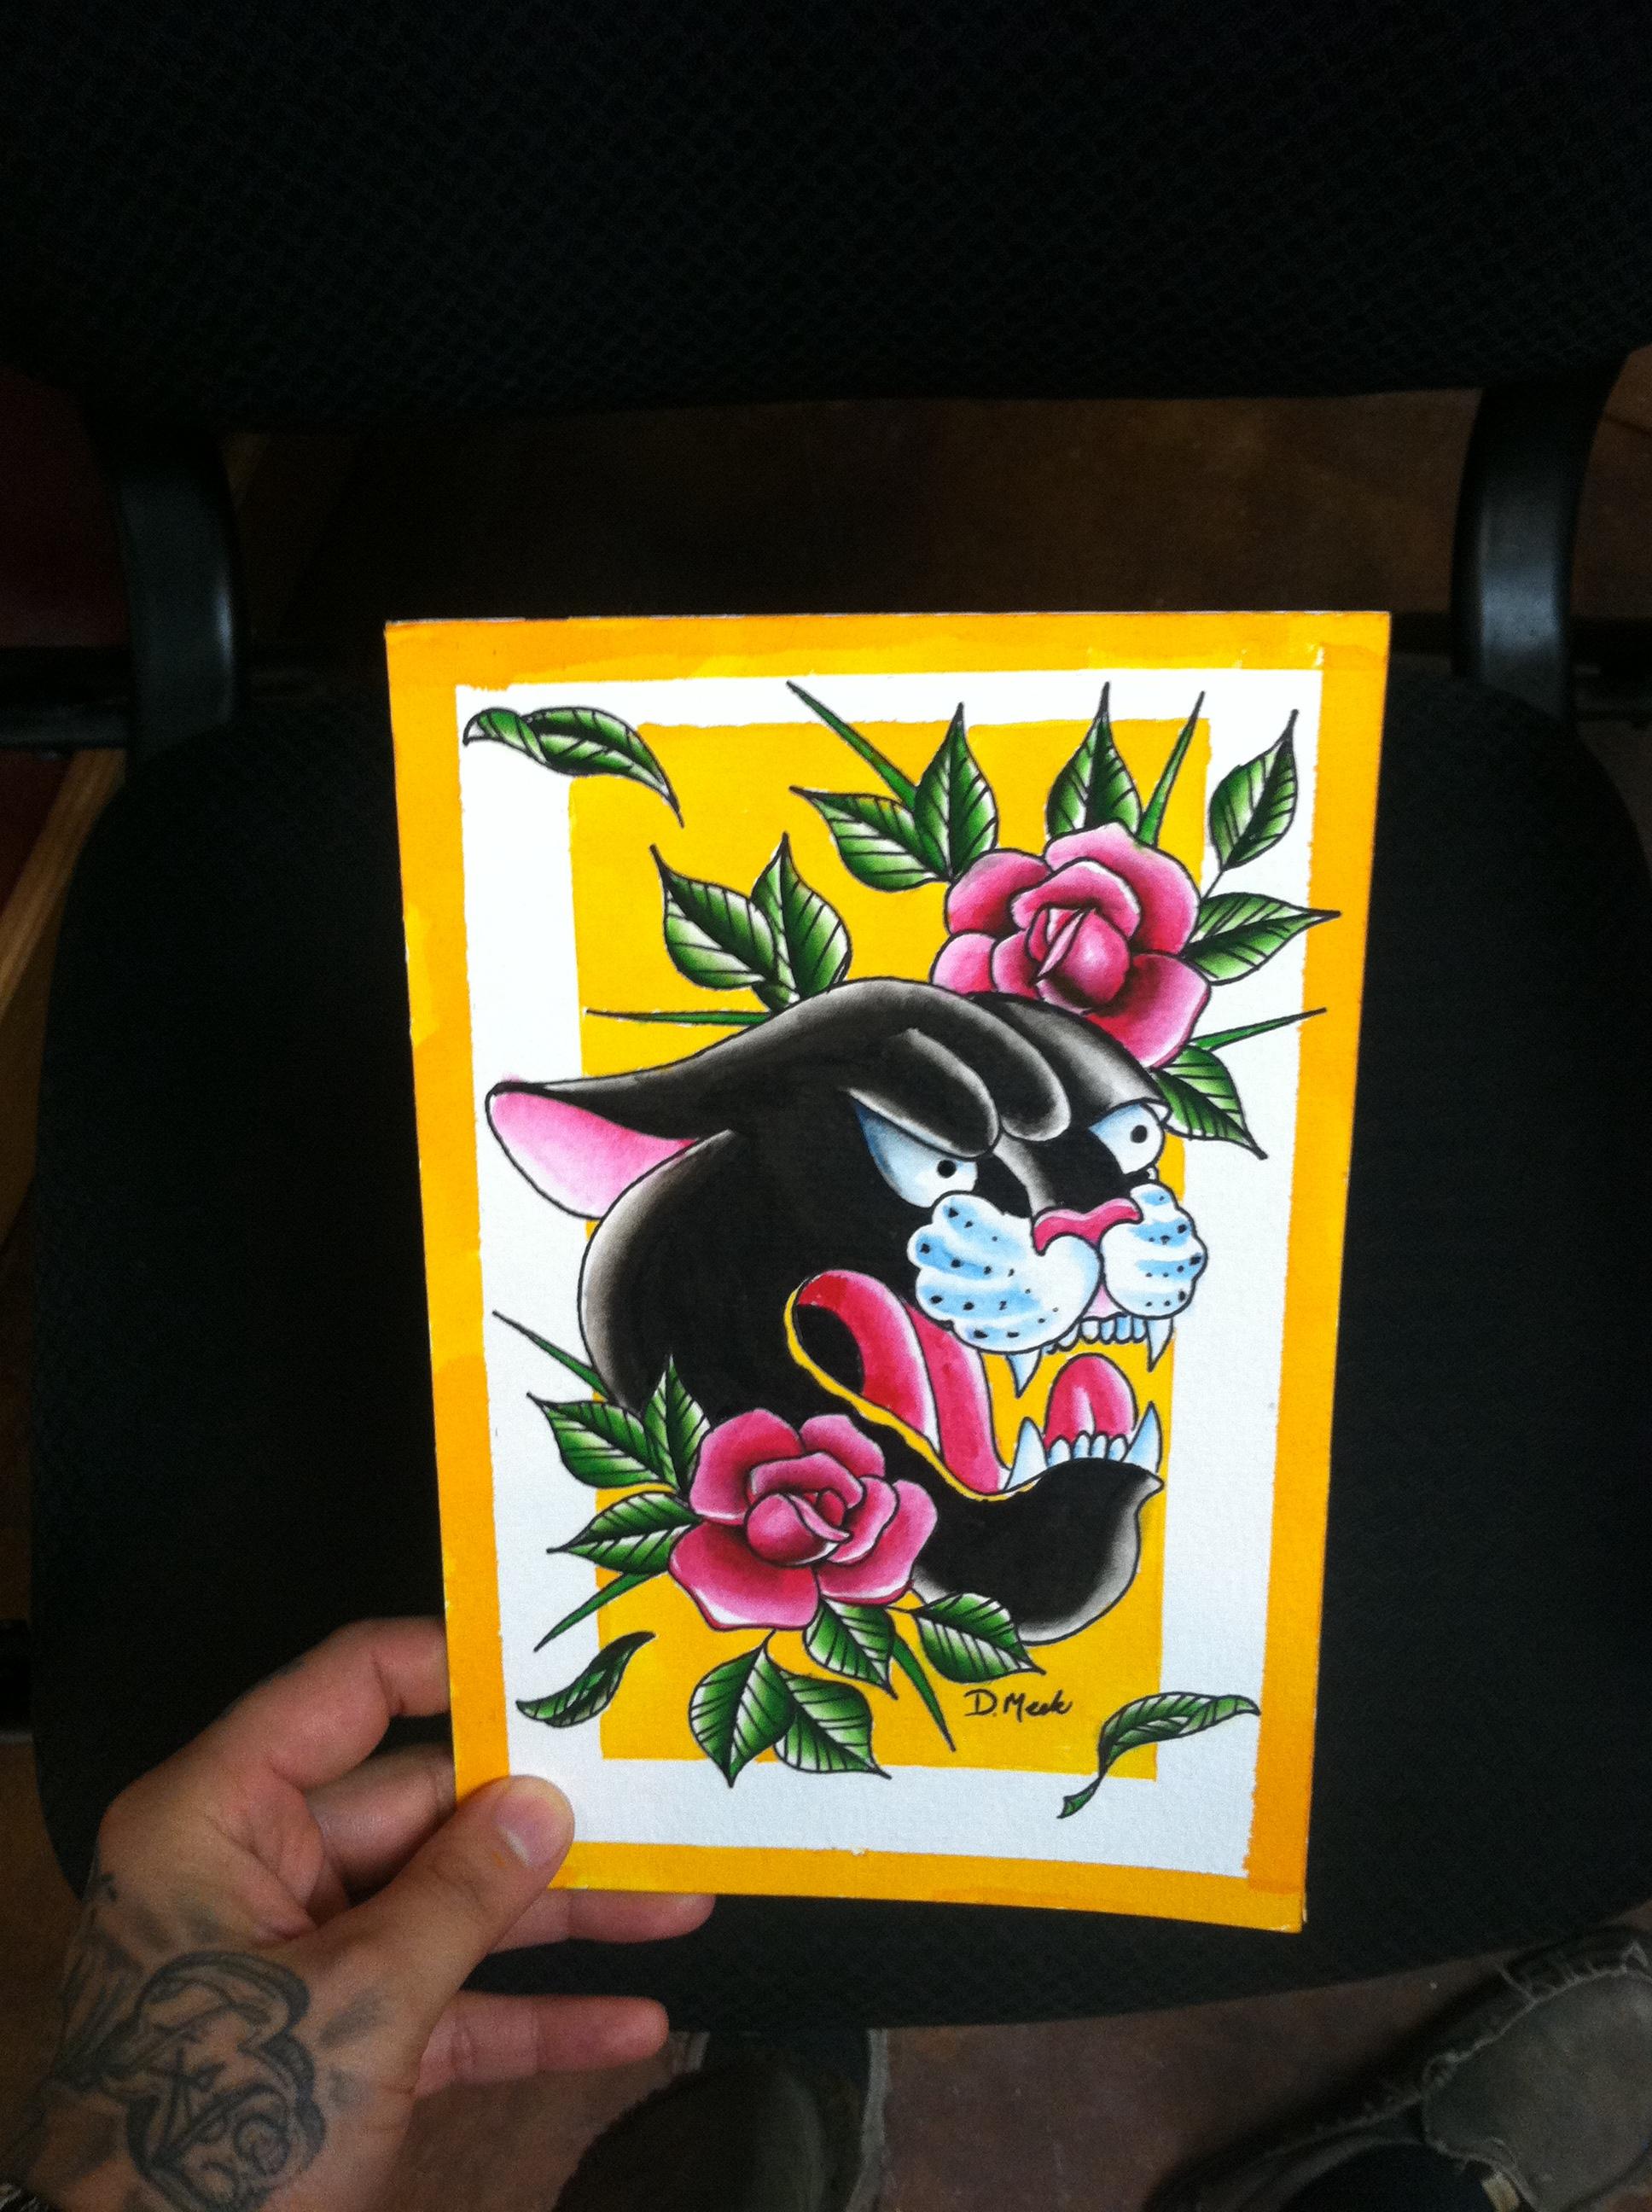 Original watercolor art for sale - 6x9 Original Watercolor Spitshade Tattoo Flash Painting By David Meek Tattoos Of Fast Lane Tattoo In